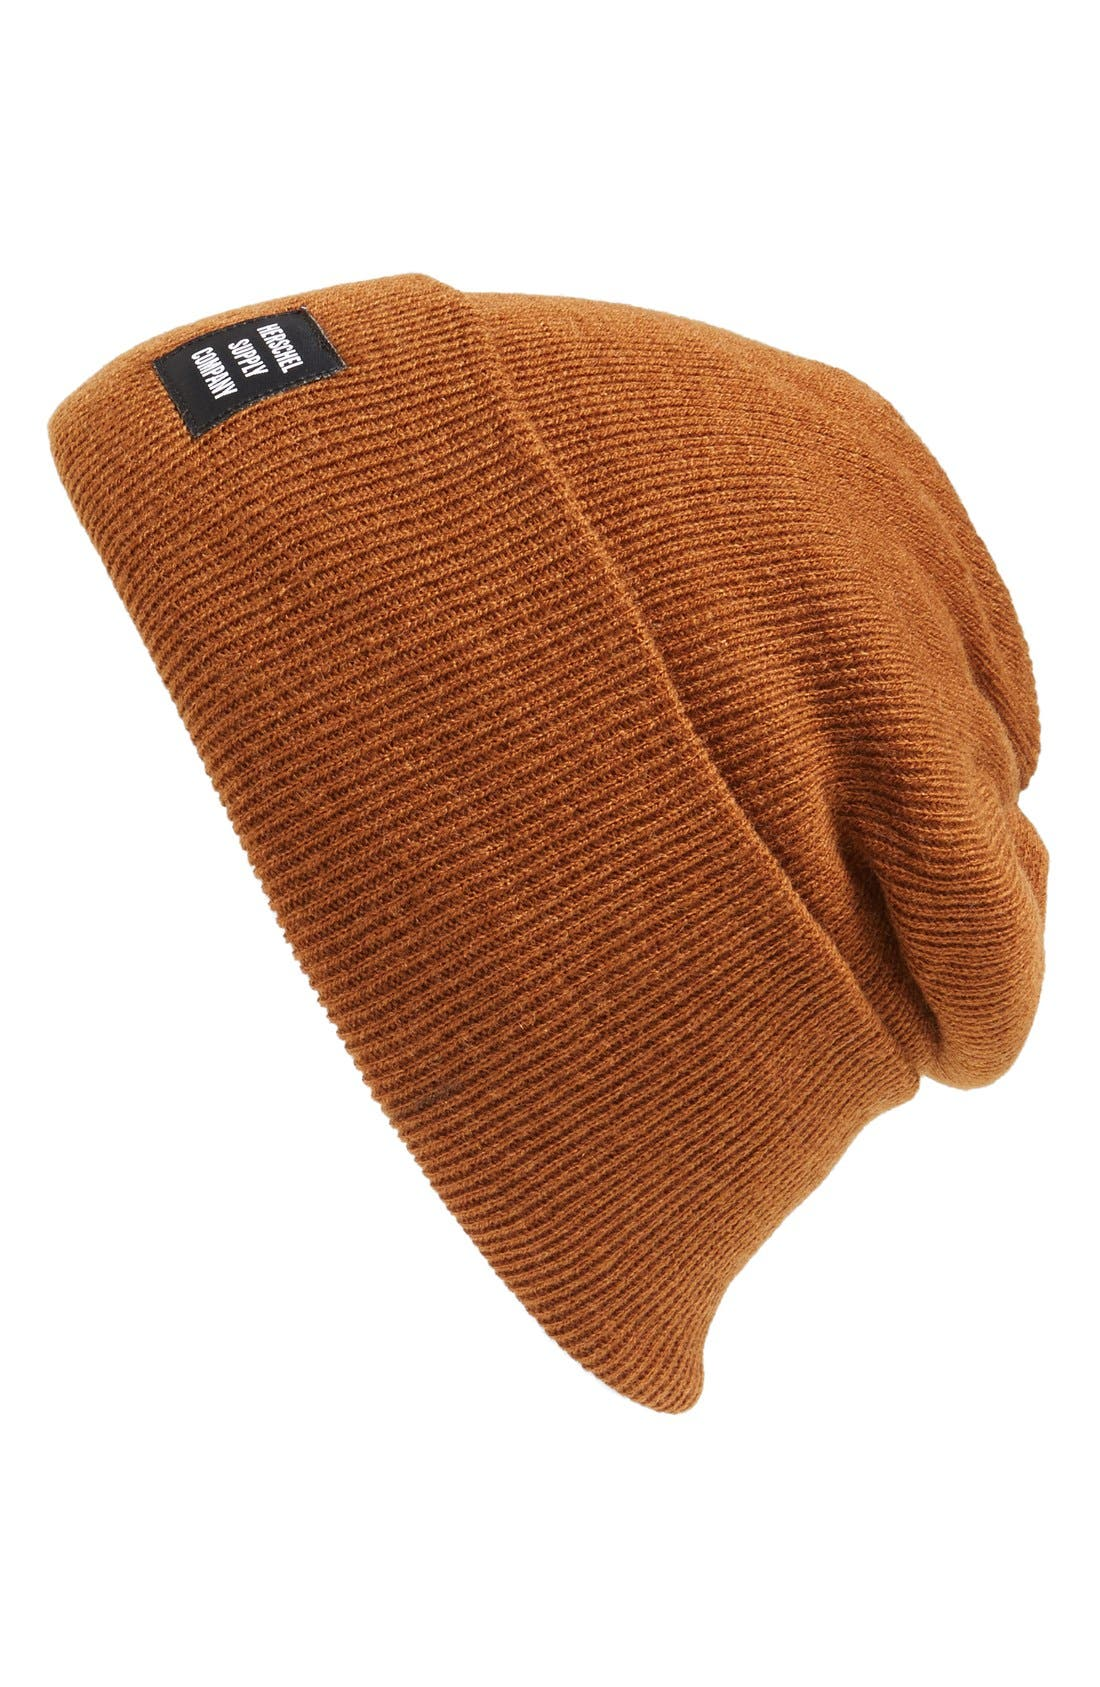 'Abbott' Knit Cap,                             Main thumbnail 4, color,